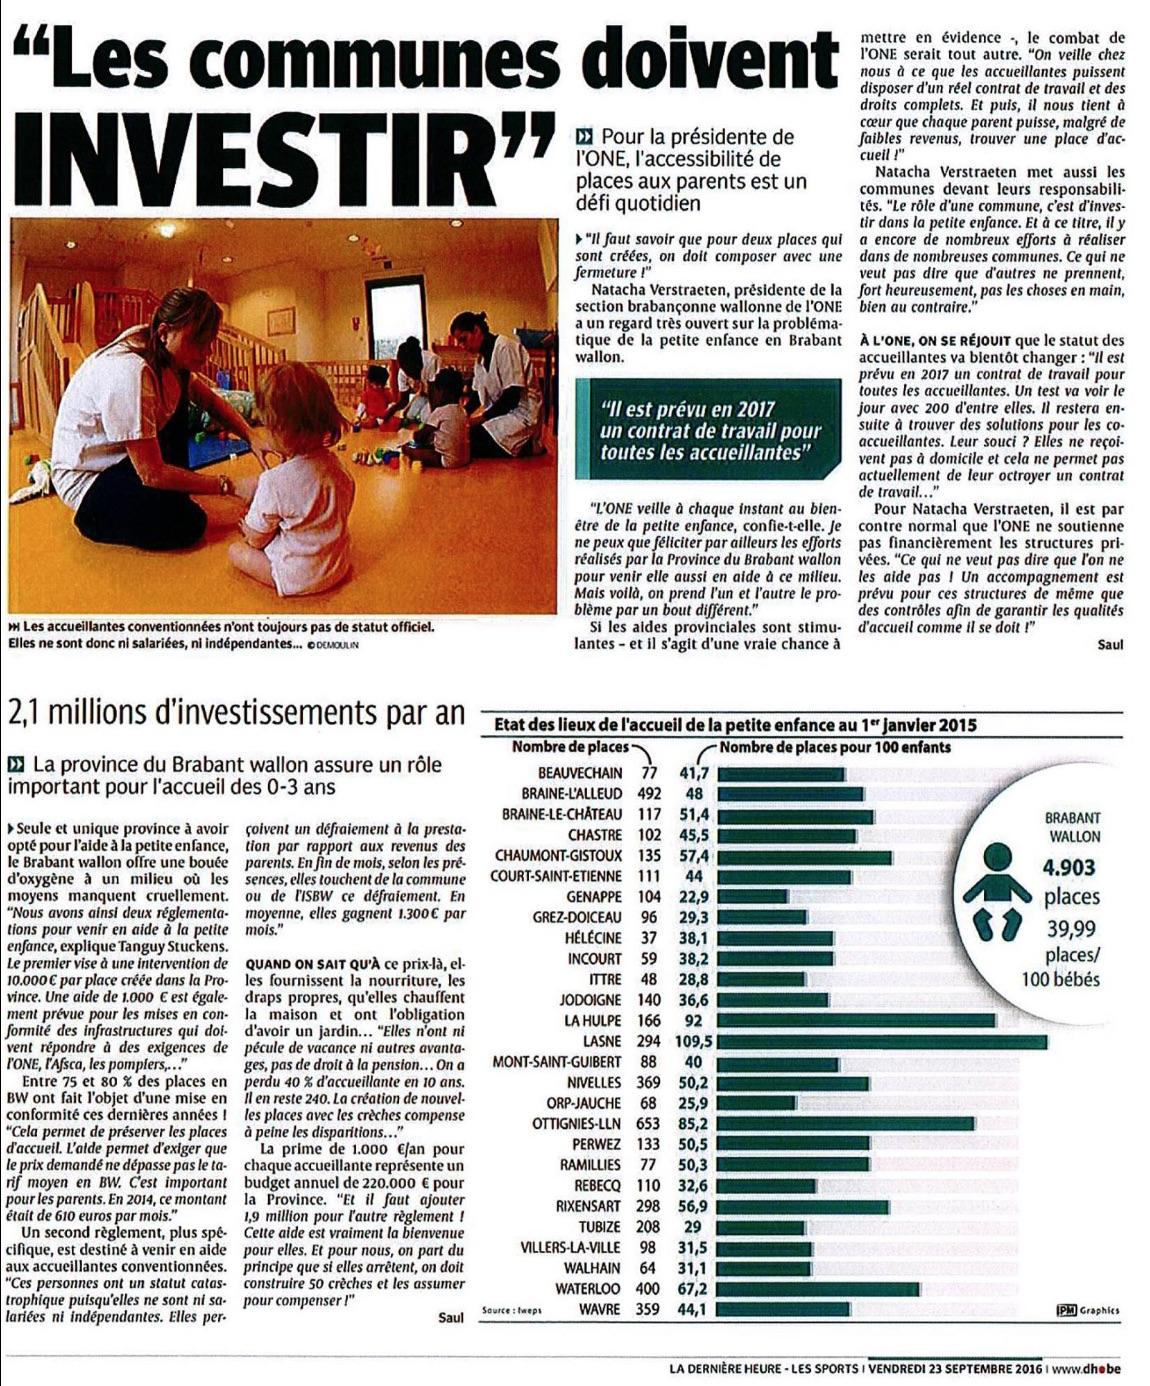 communes-doivent-investir-dh23092016